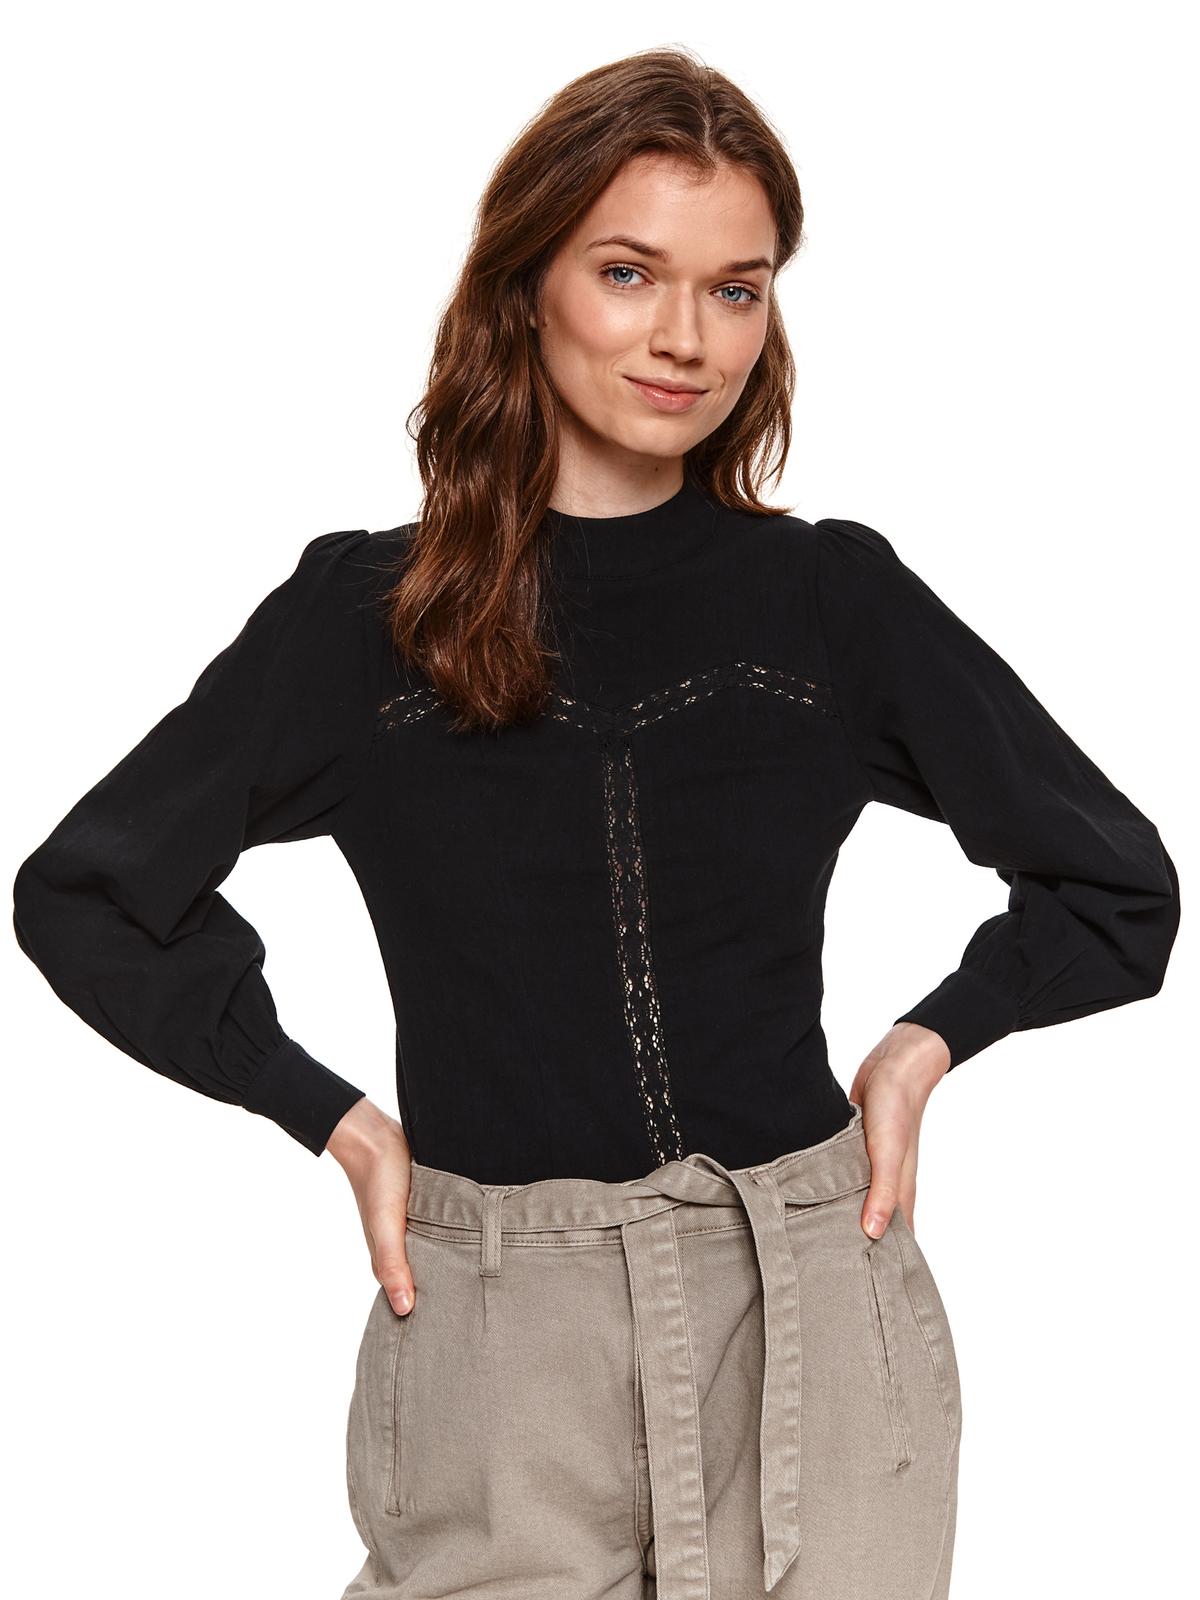 With turtle neck elastic held sleeves black women`s blouse